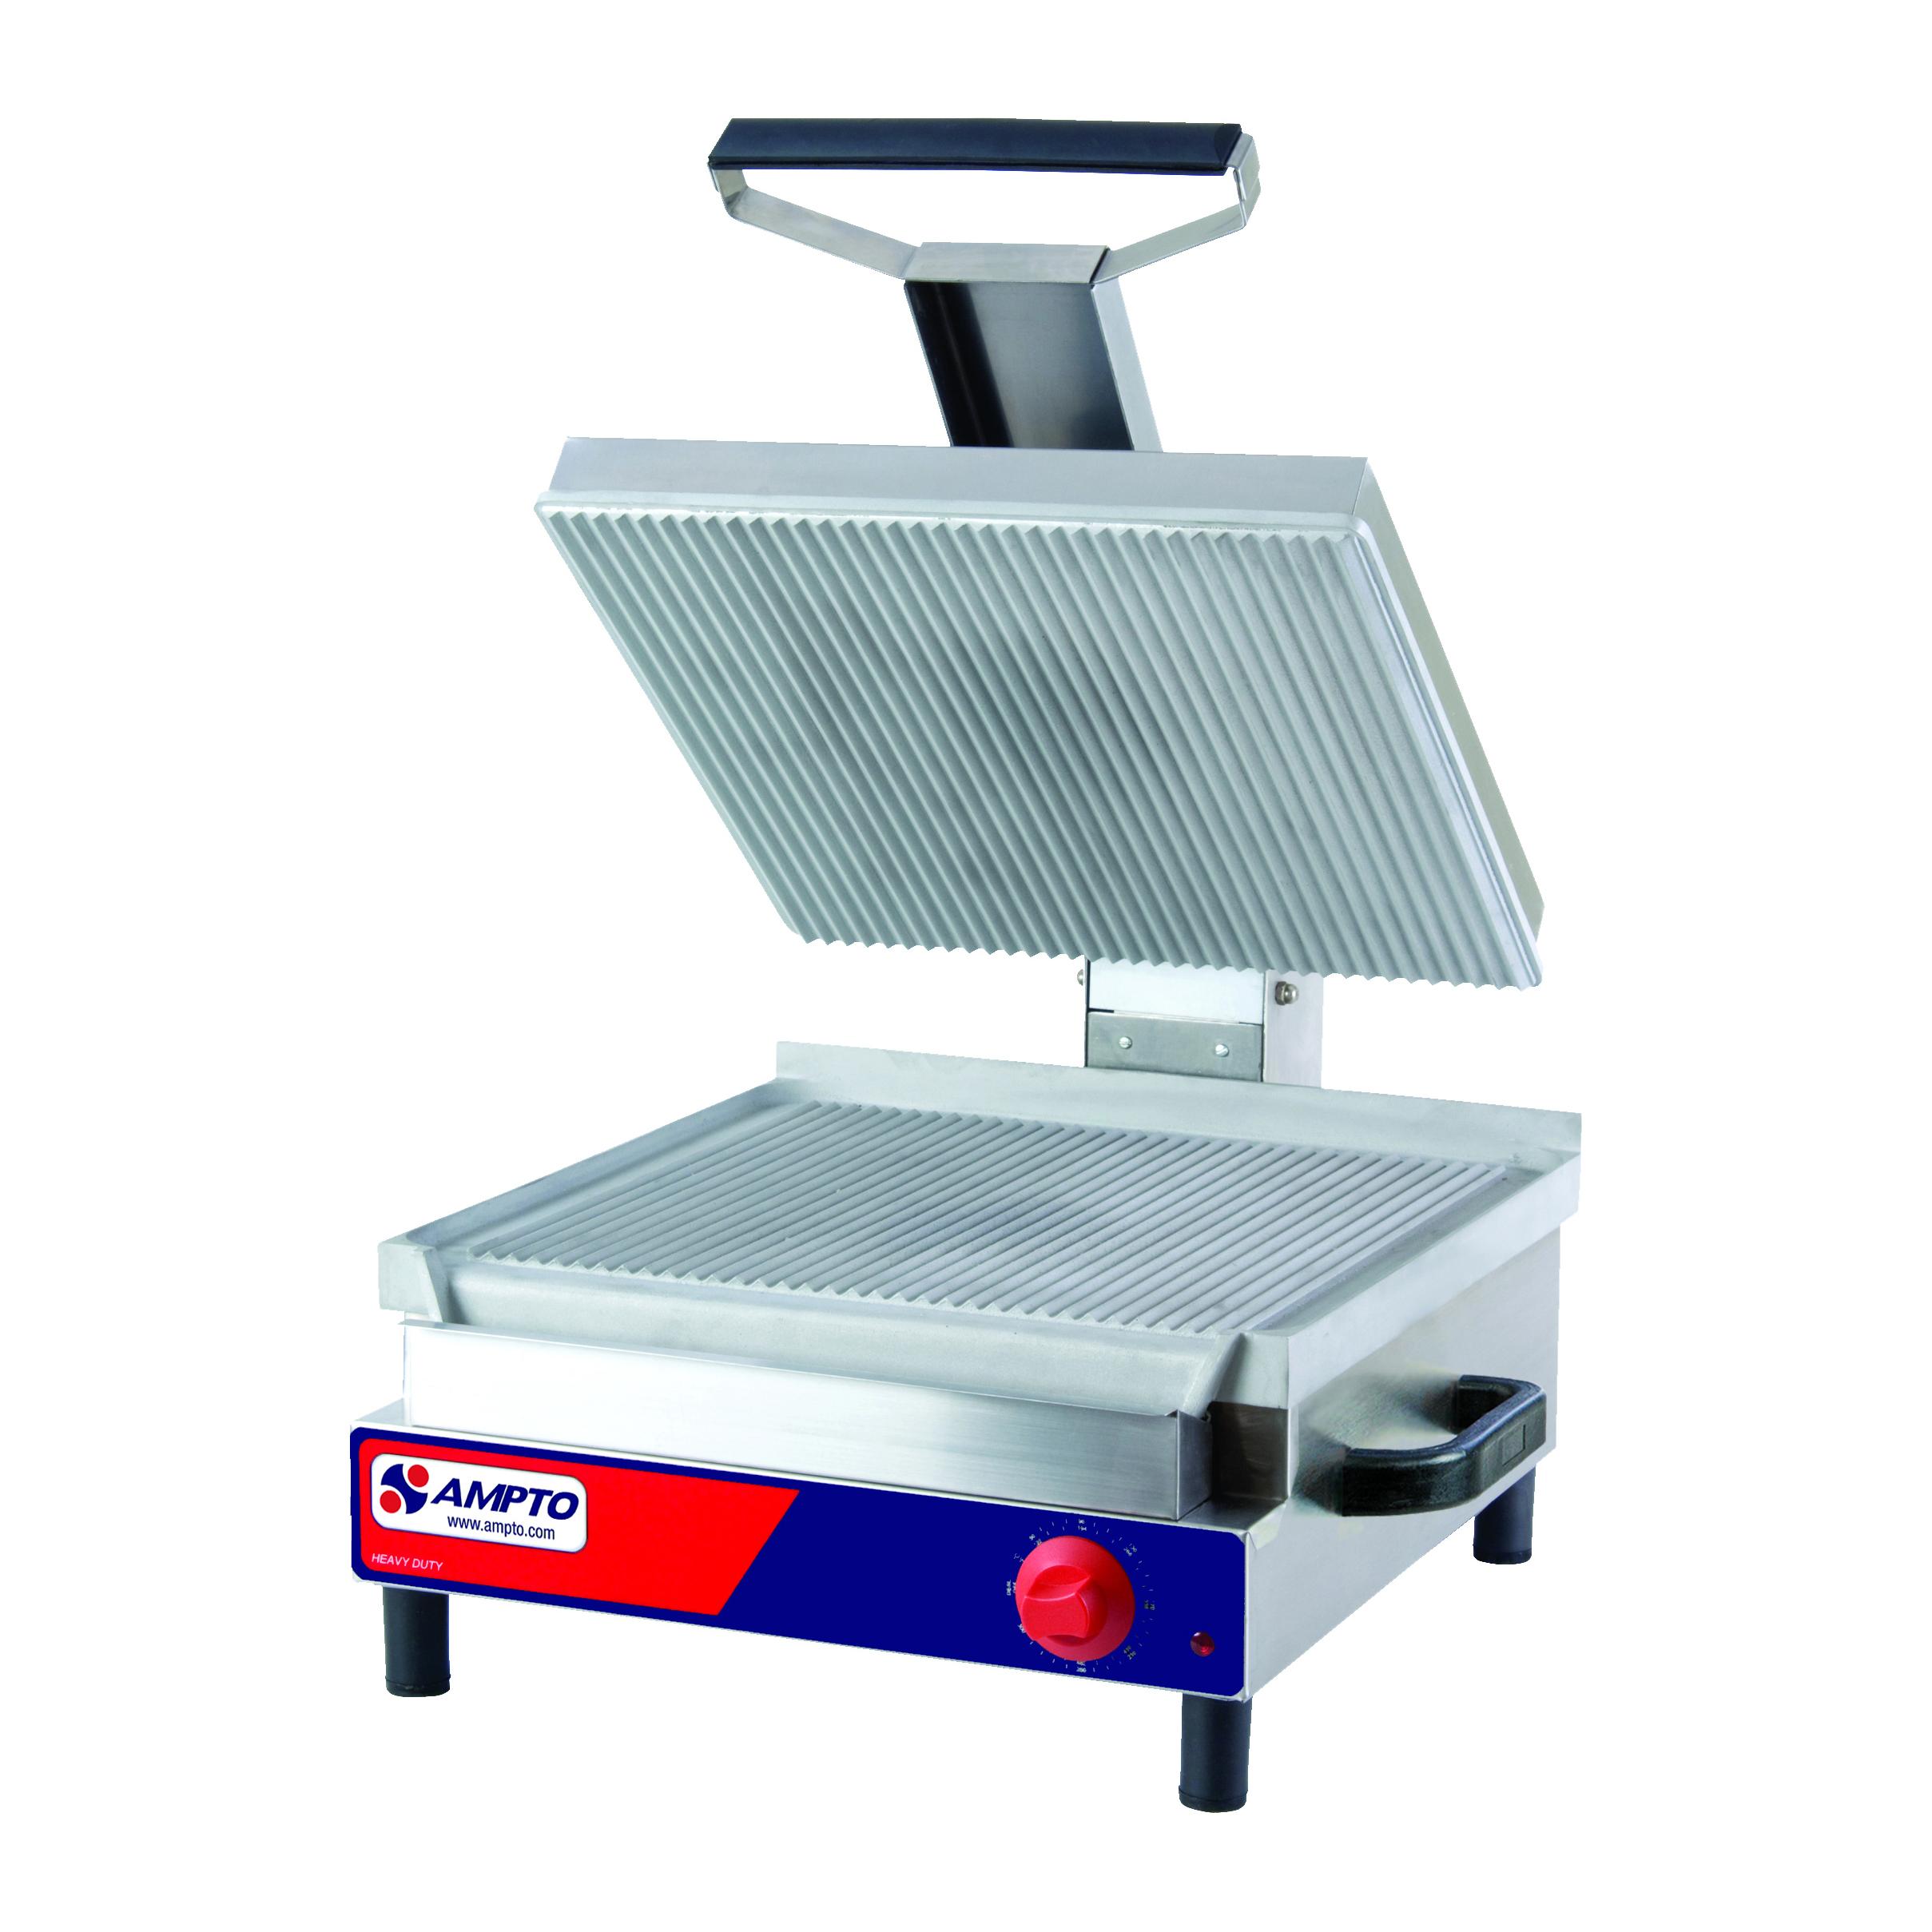 SSGE AMPTO sandwich / panini grill